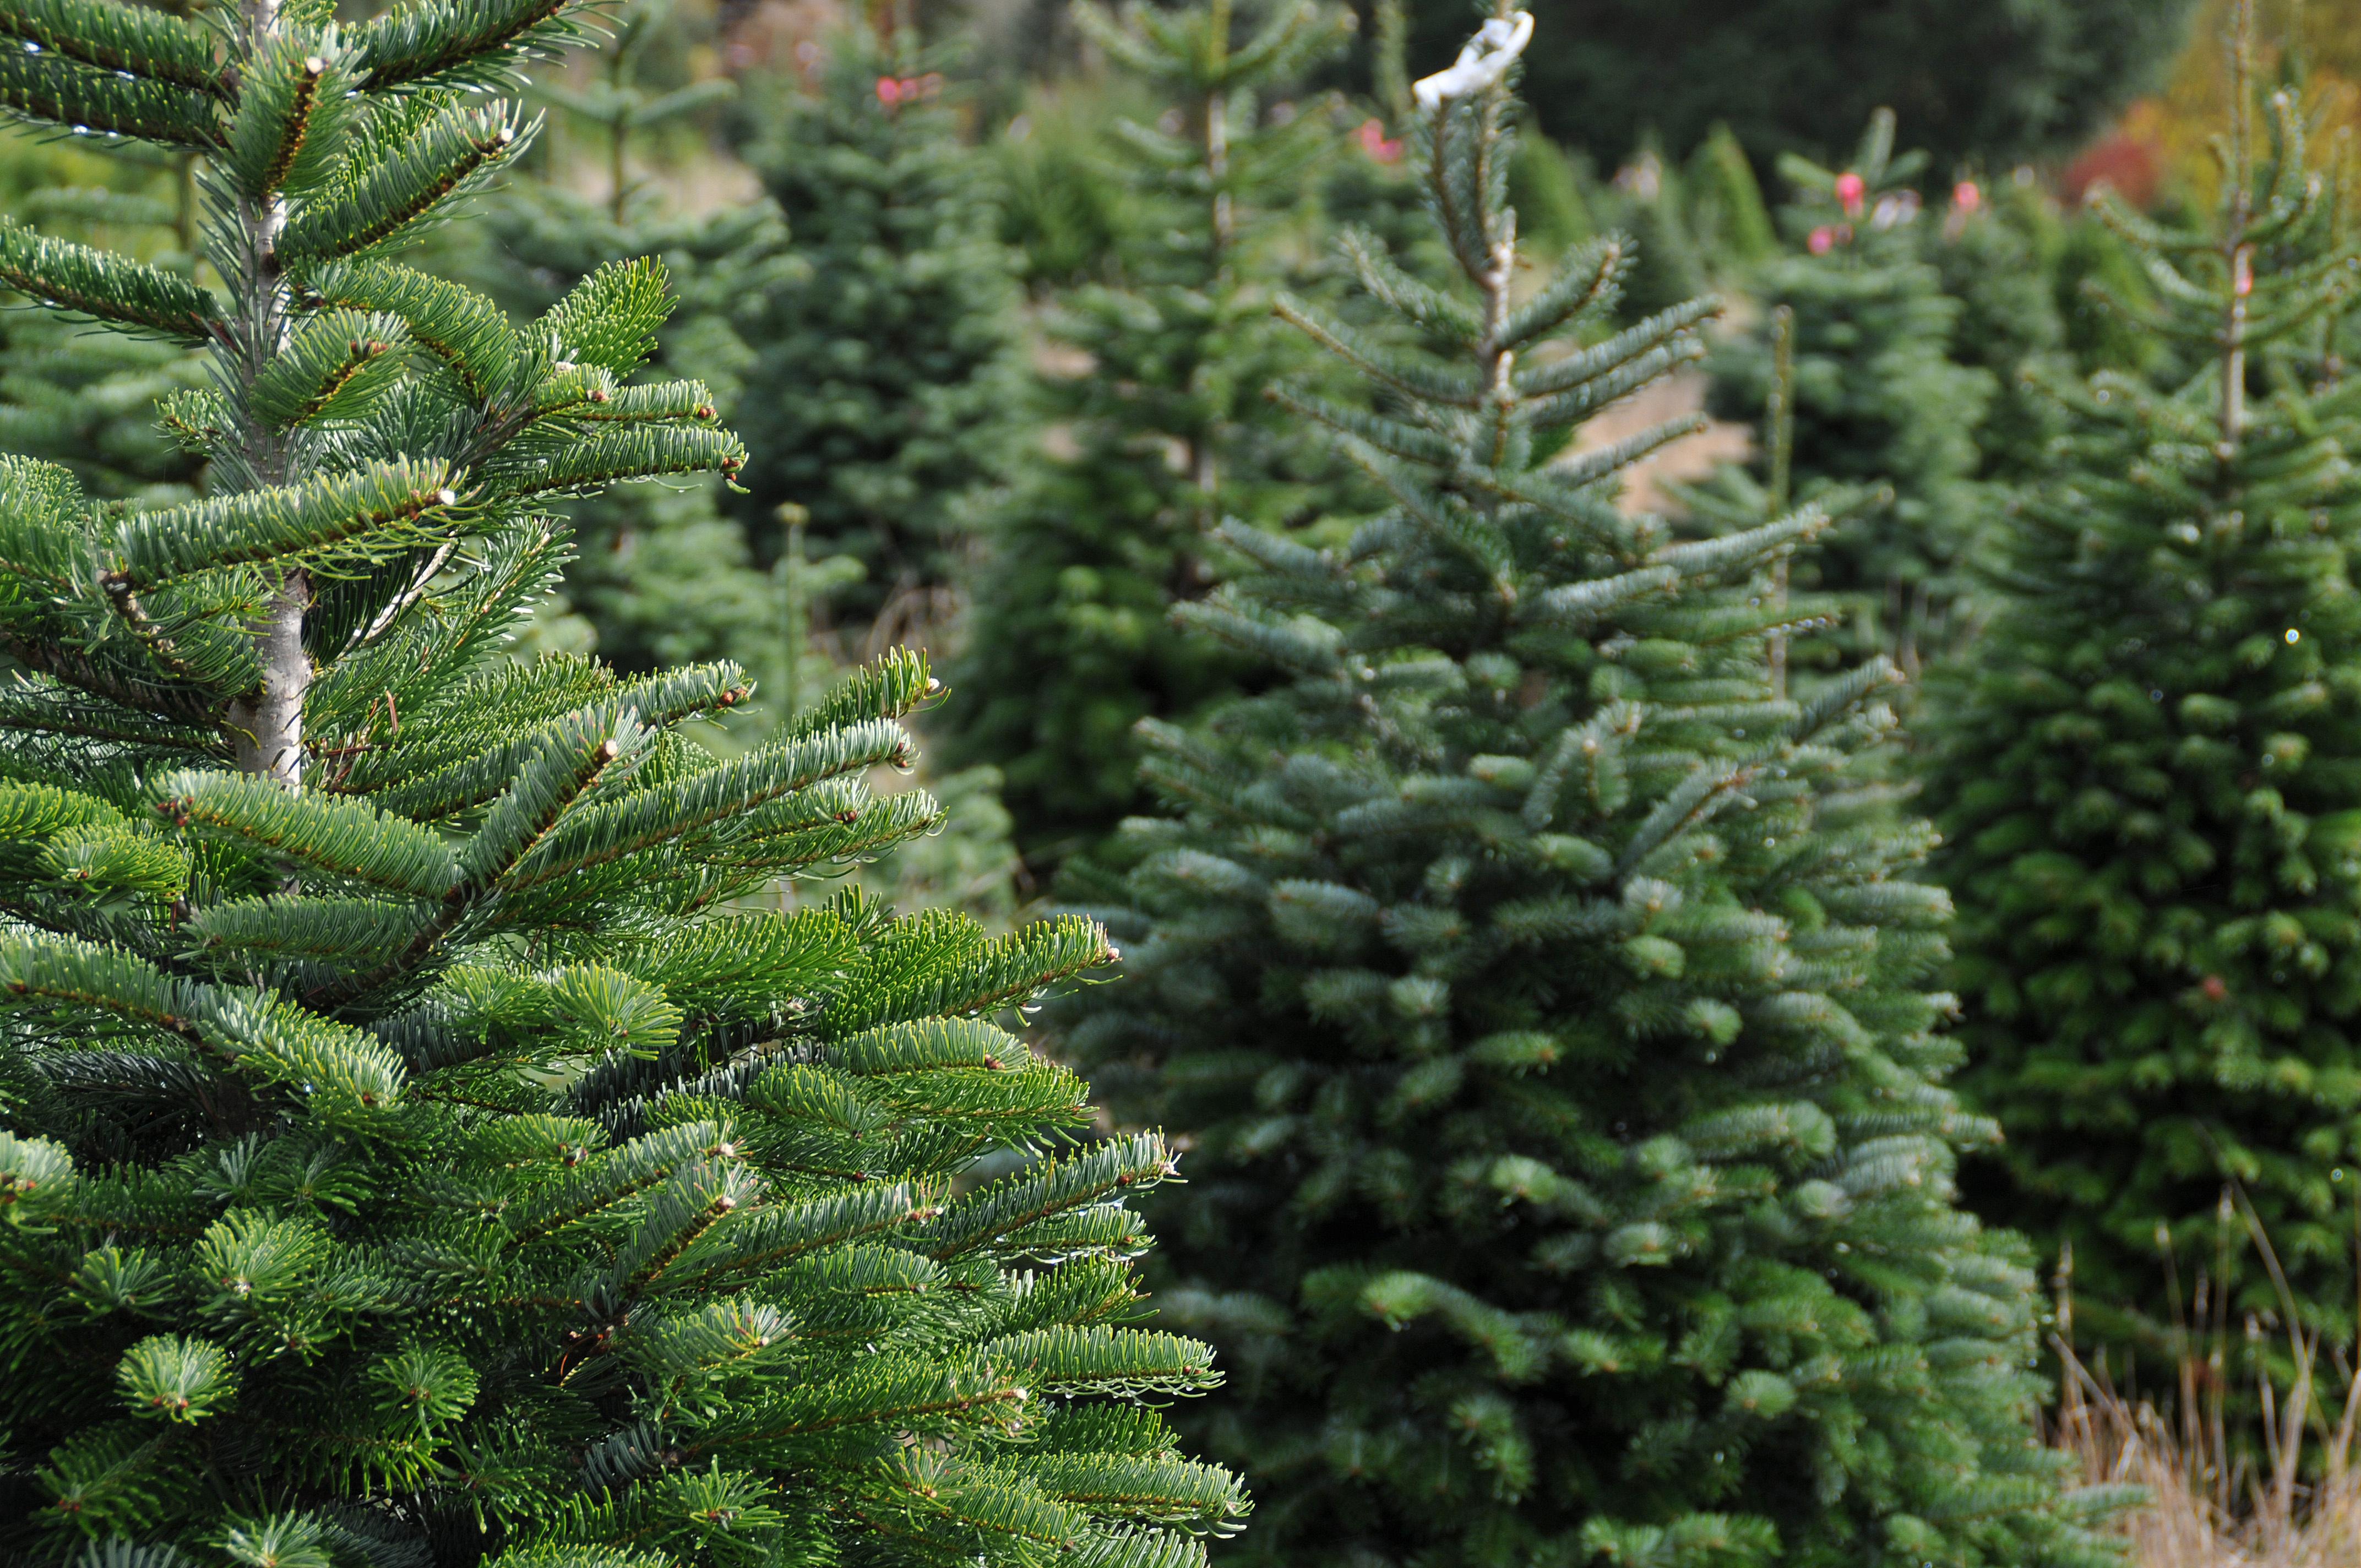 Giant Artificial Christmas tree